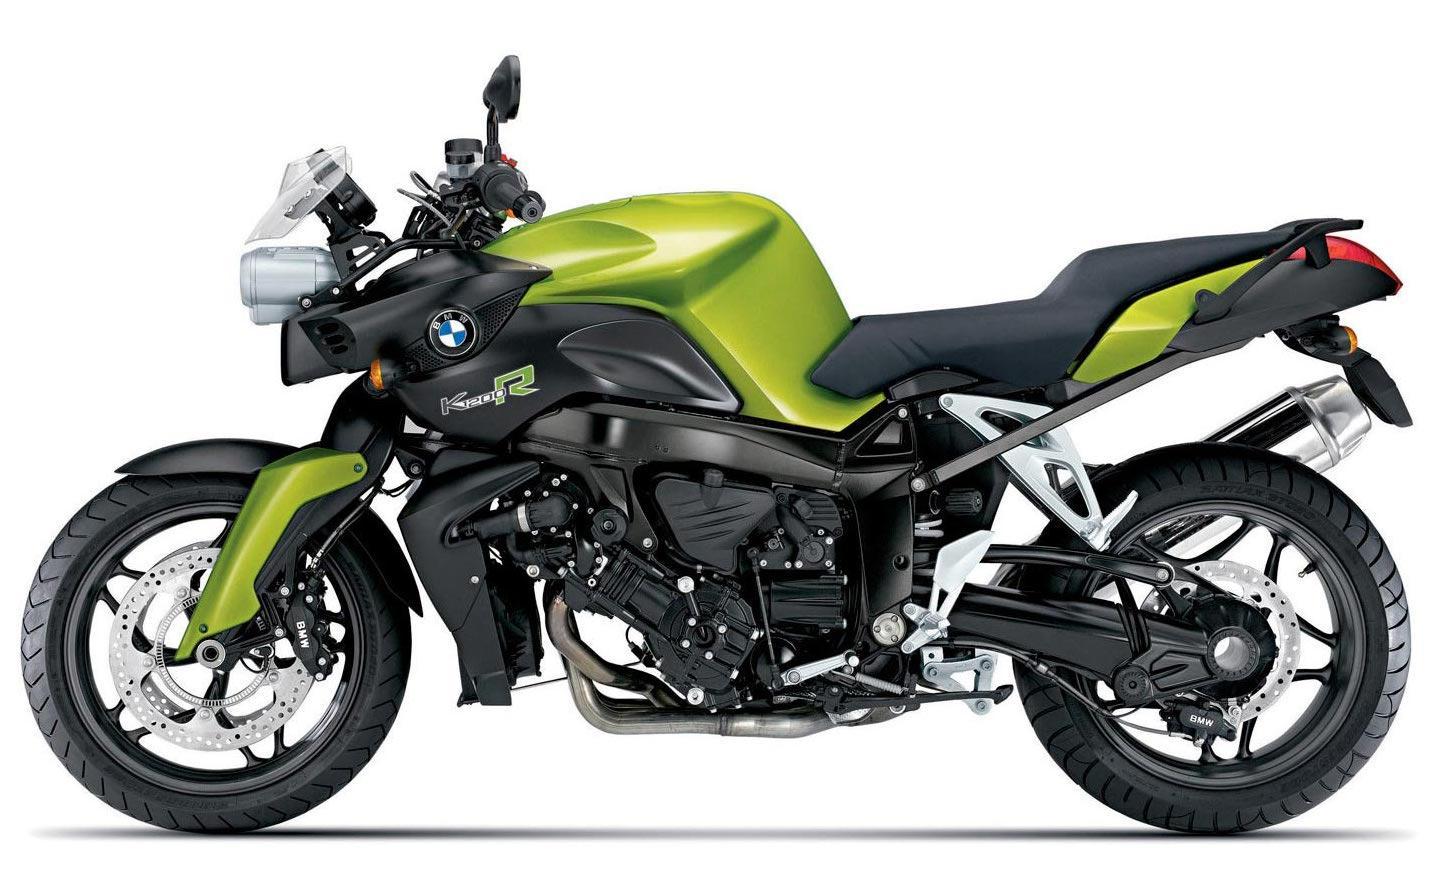 Bmw Motorcycles K